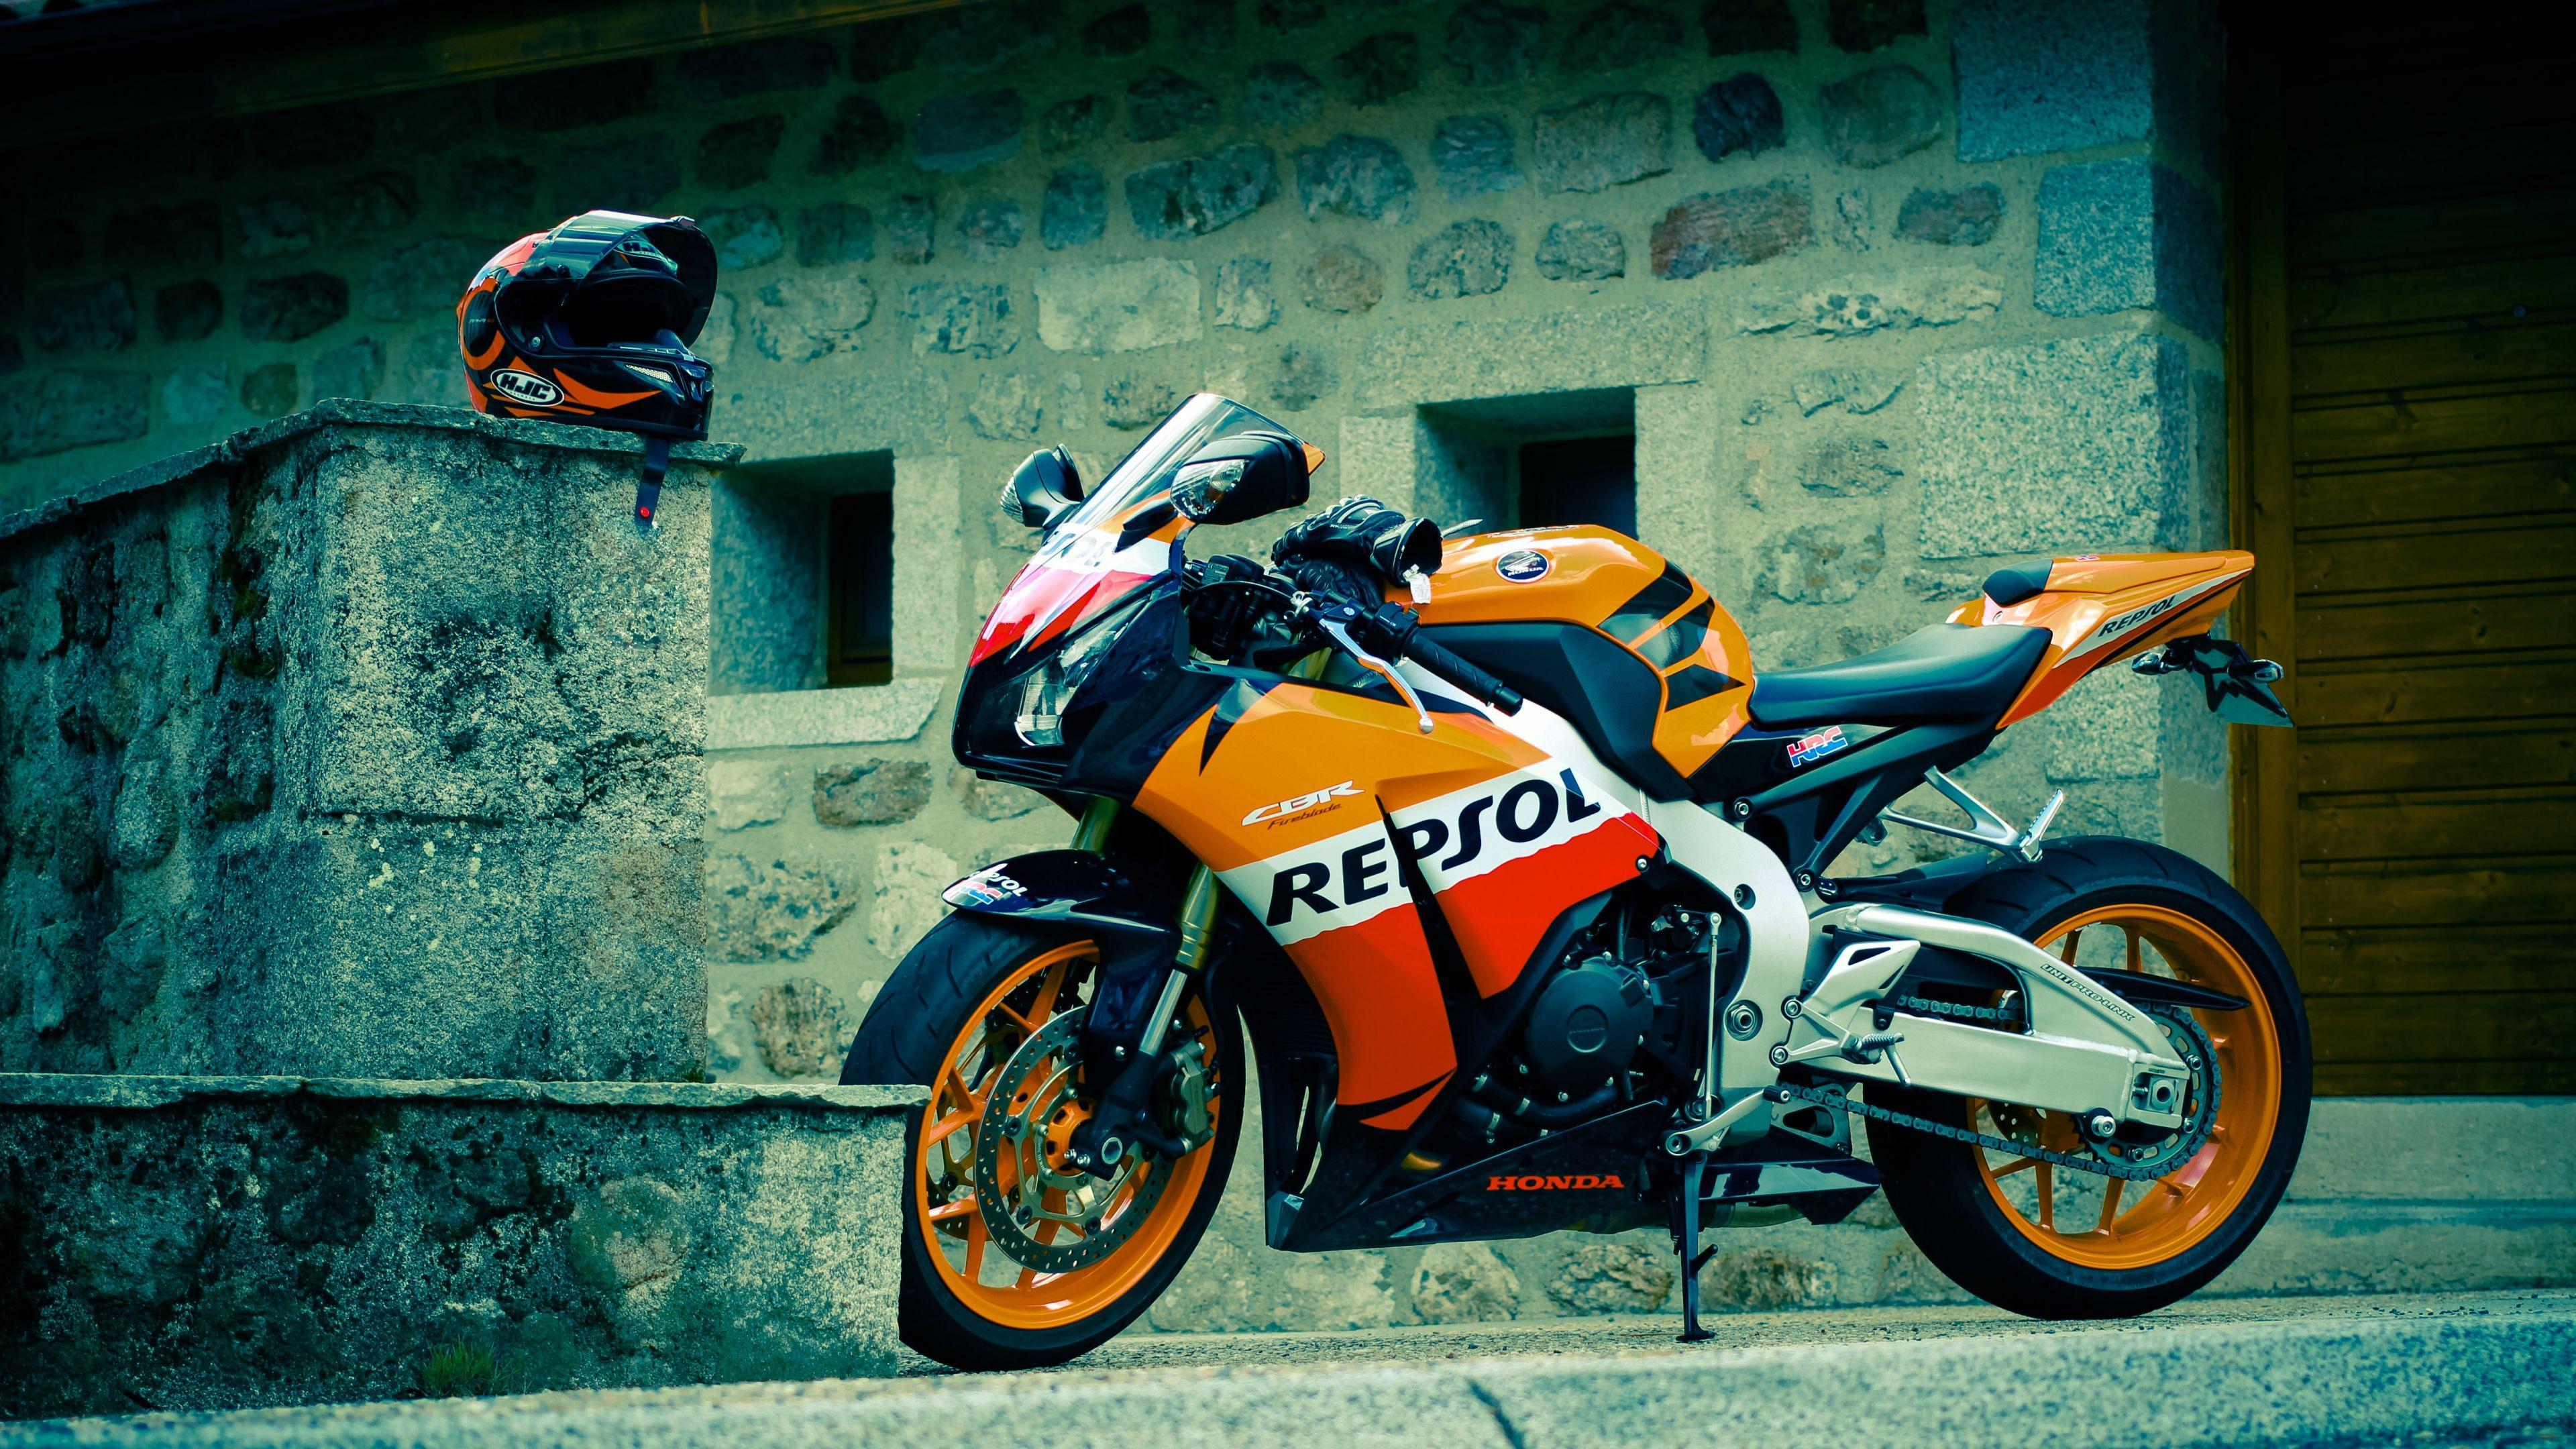 Honda CBR Repsol Wallpapers